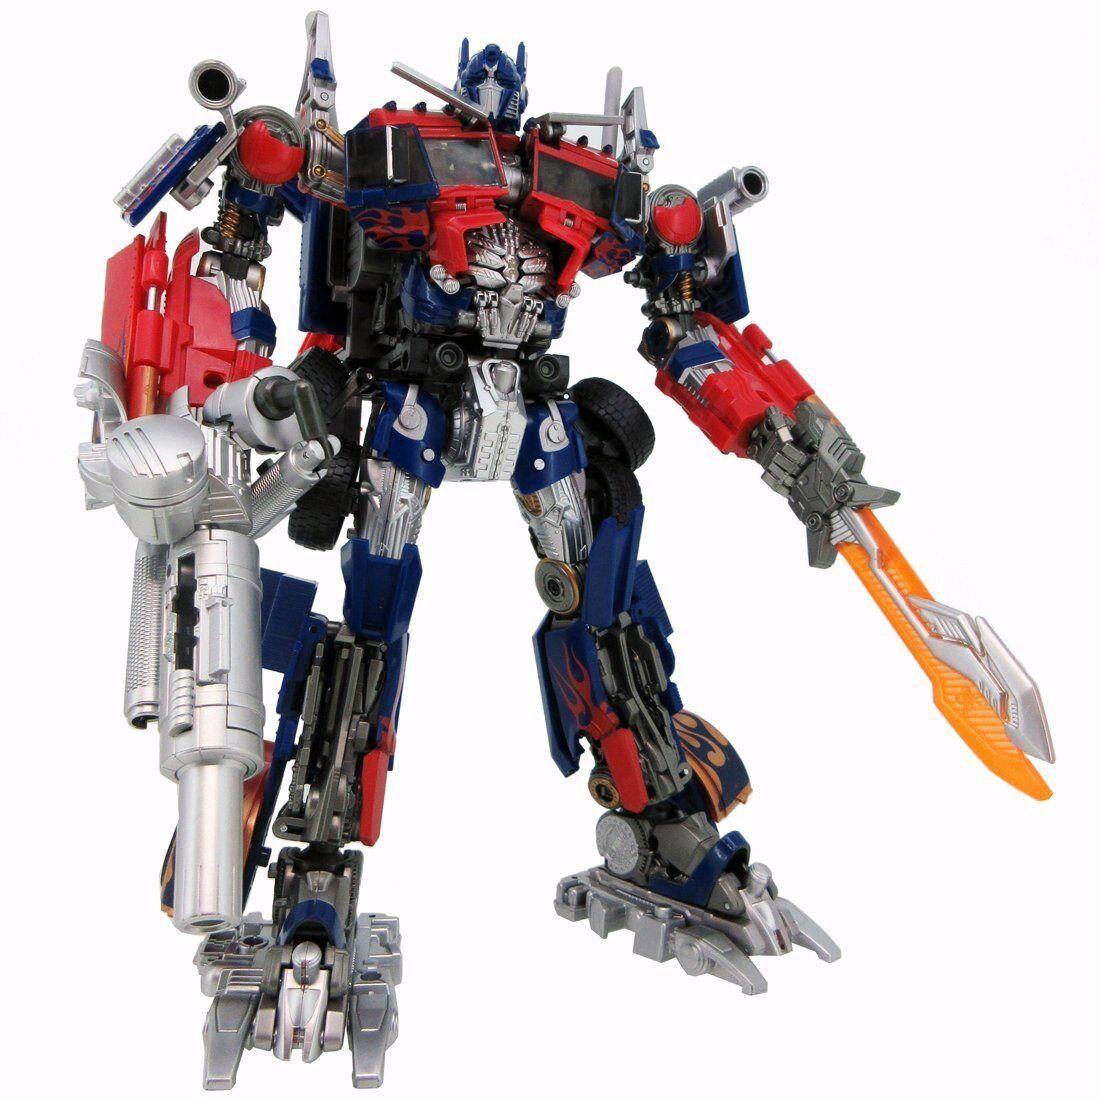 Takara Tomy Transformers MB-11 MOVIE 10th ANNIVERSARIO OPTIMUS PRIME JAPAN VER.